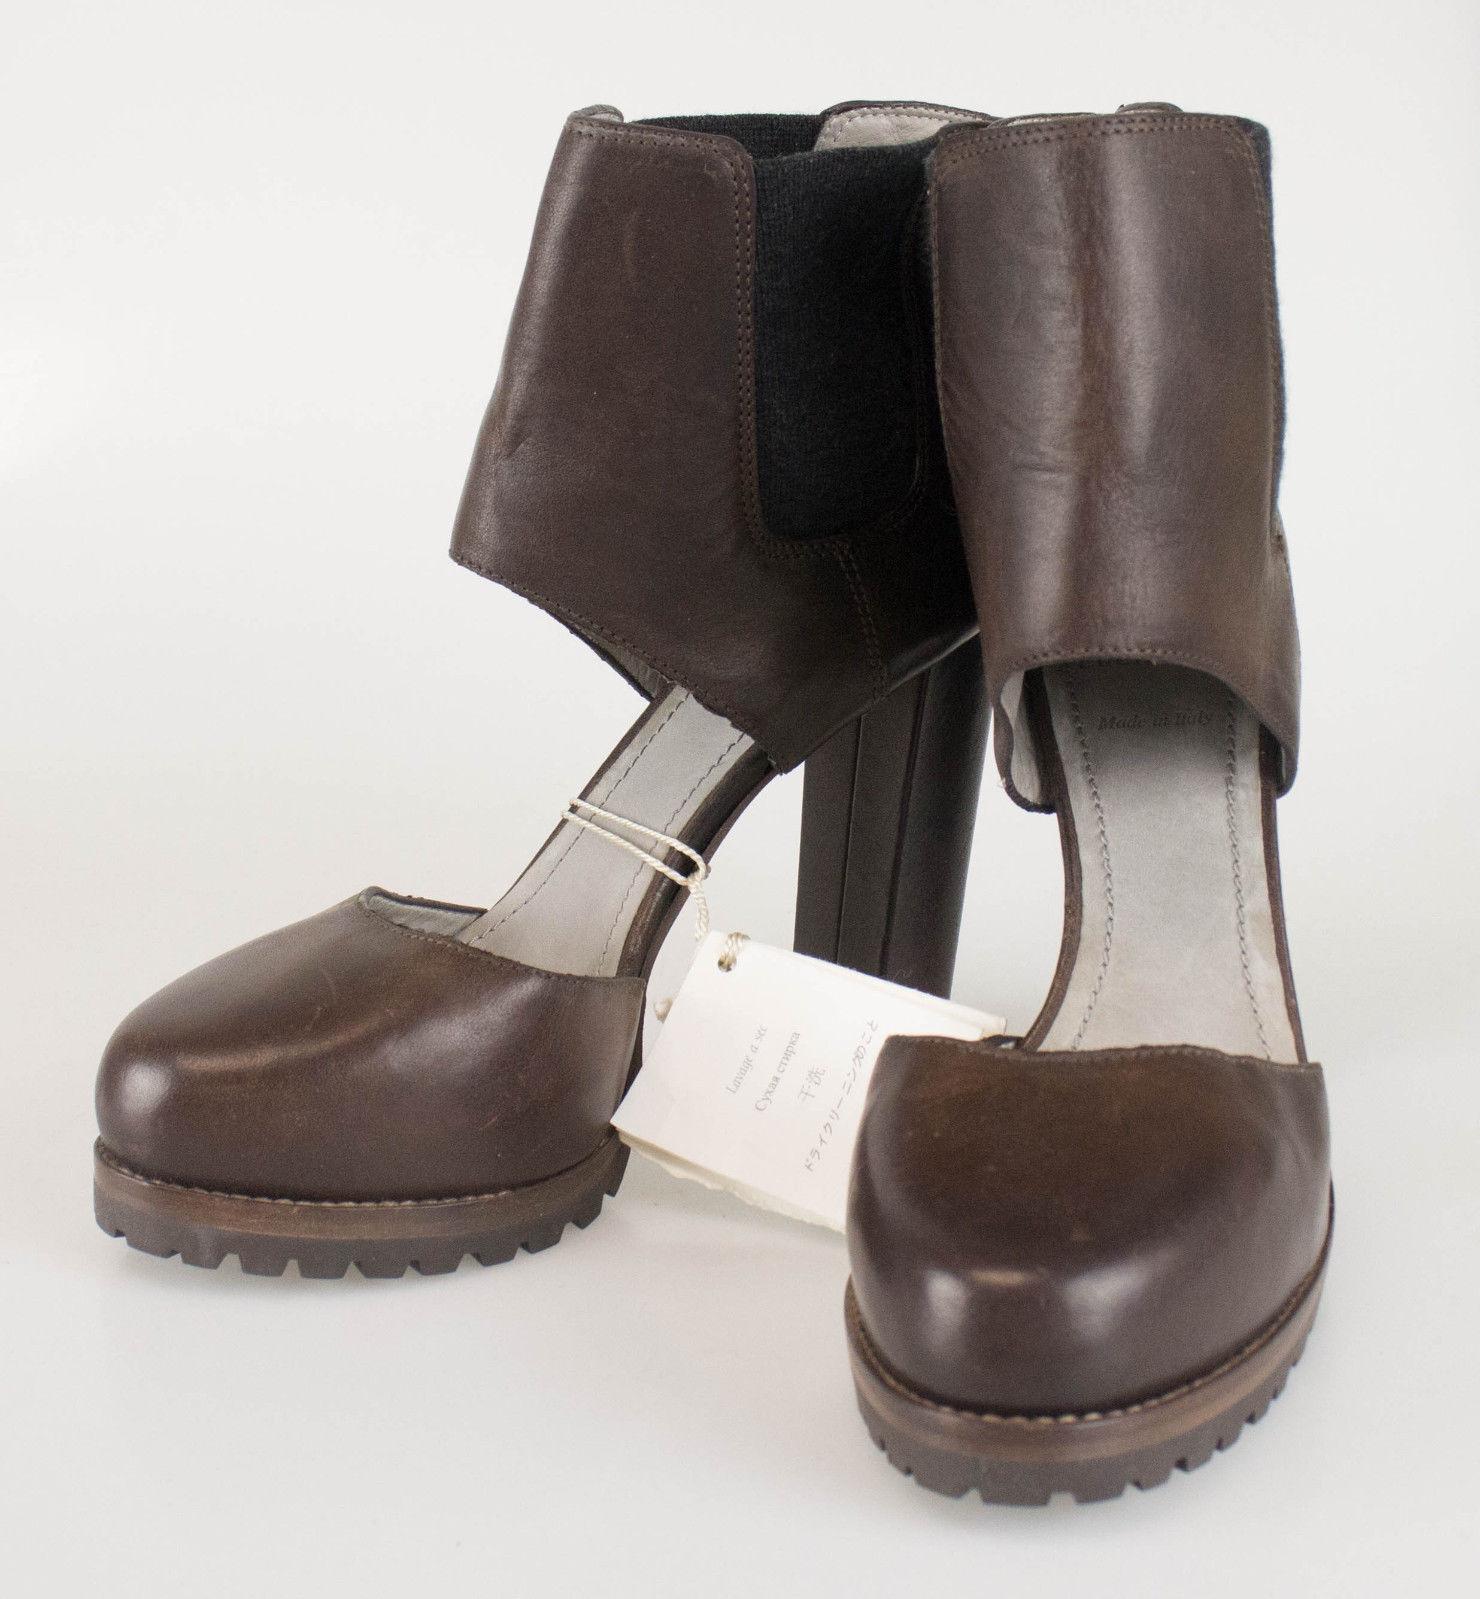 New. BRUNELLO CUCINELLI Brown Leather Platform Heels shoes Size 7 37